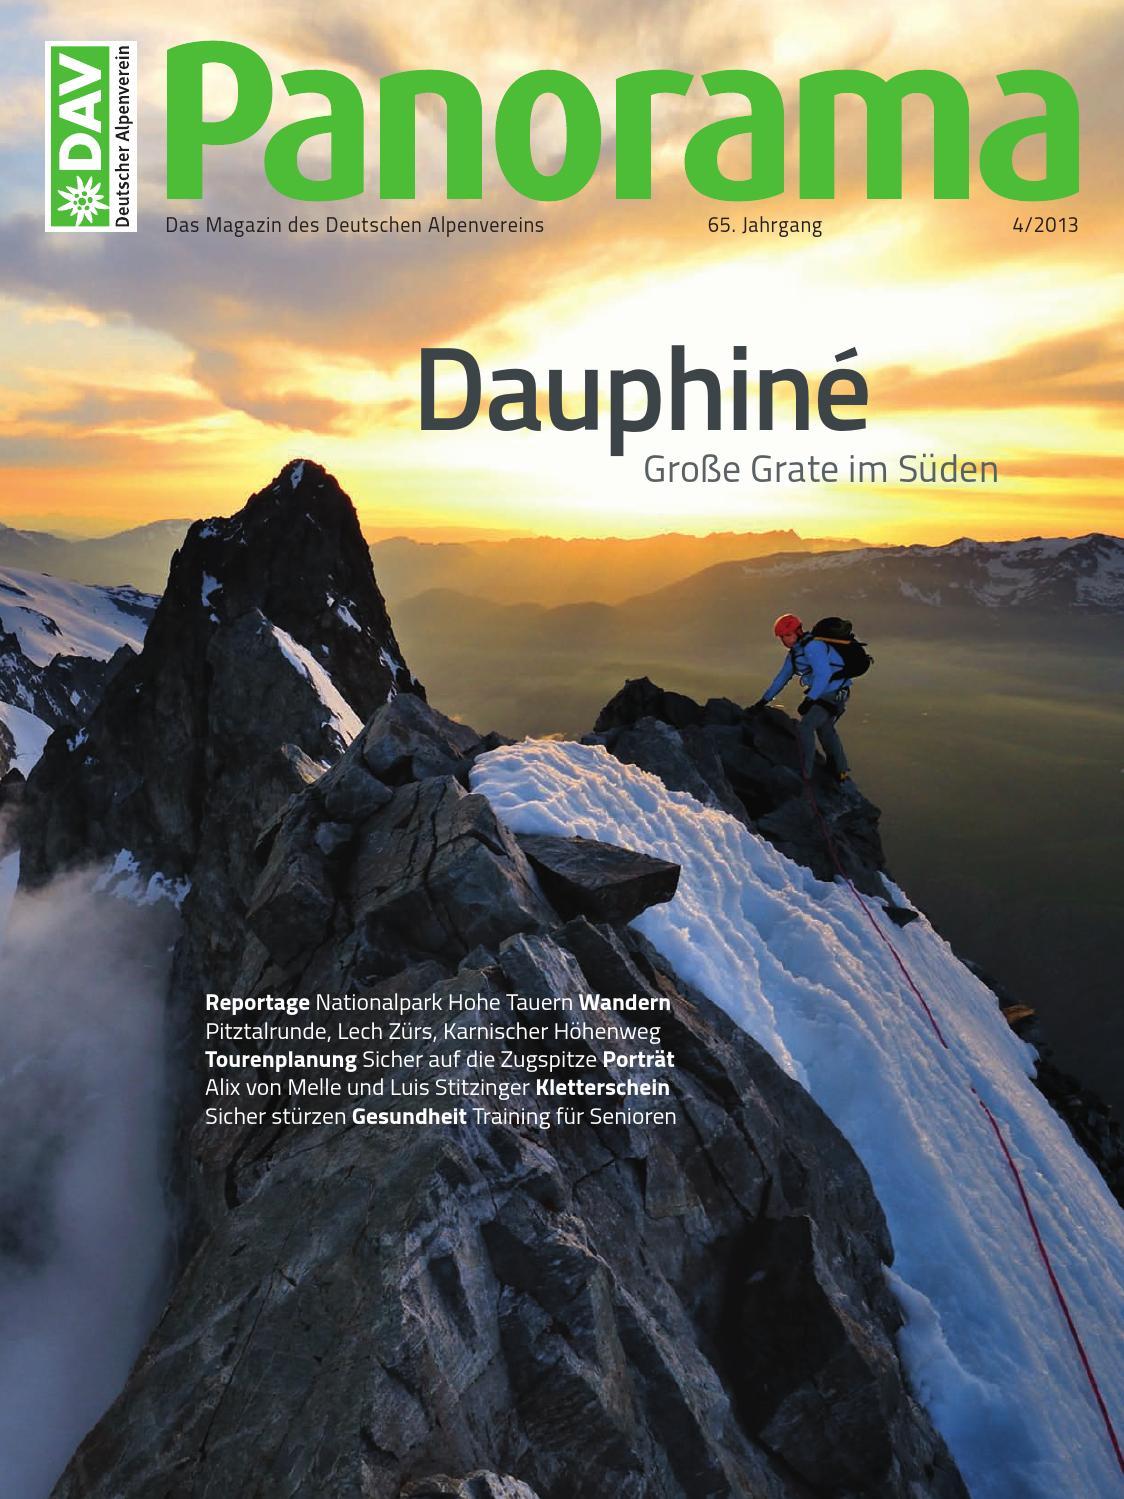 höchster berg der pyrenäen kreuzworträtsel 5 buchstaben